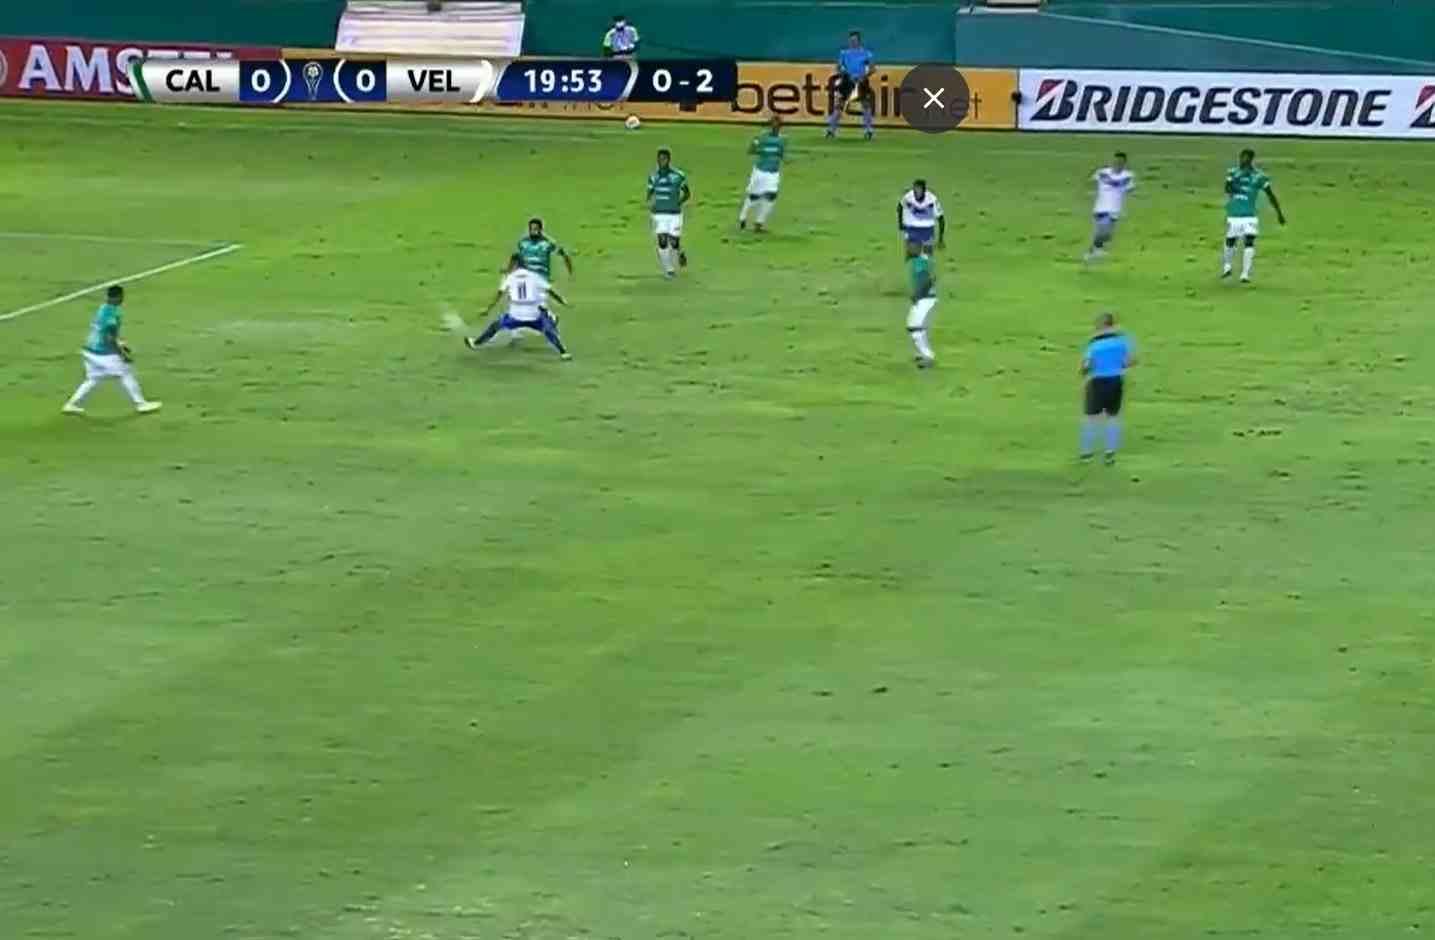 Pifia de Menosse y Vélez castiga al Deportivo Cali